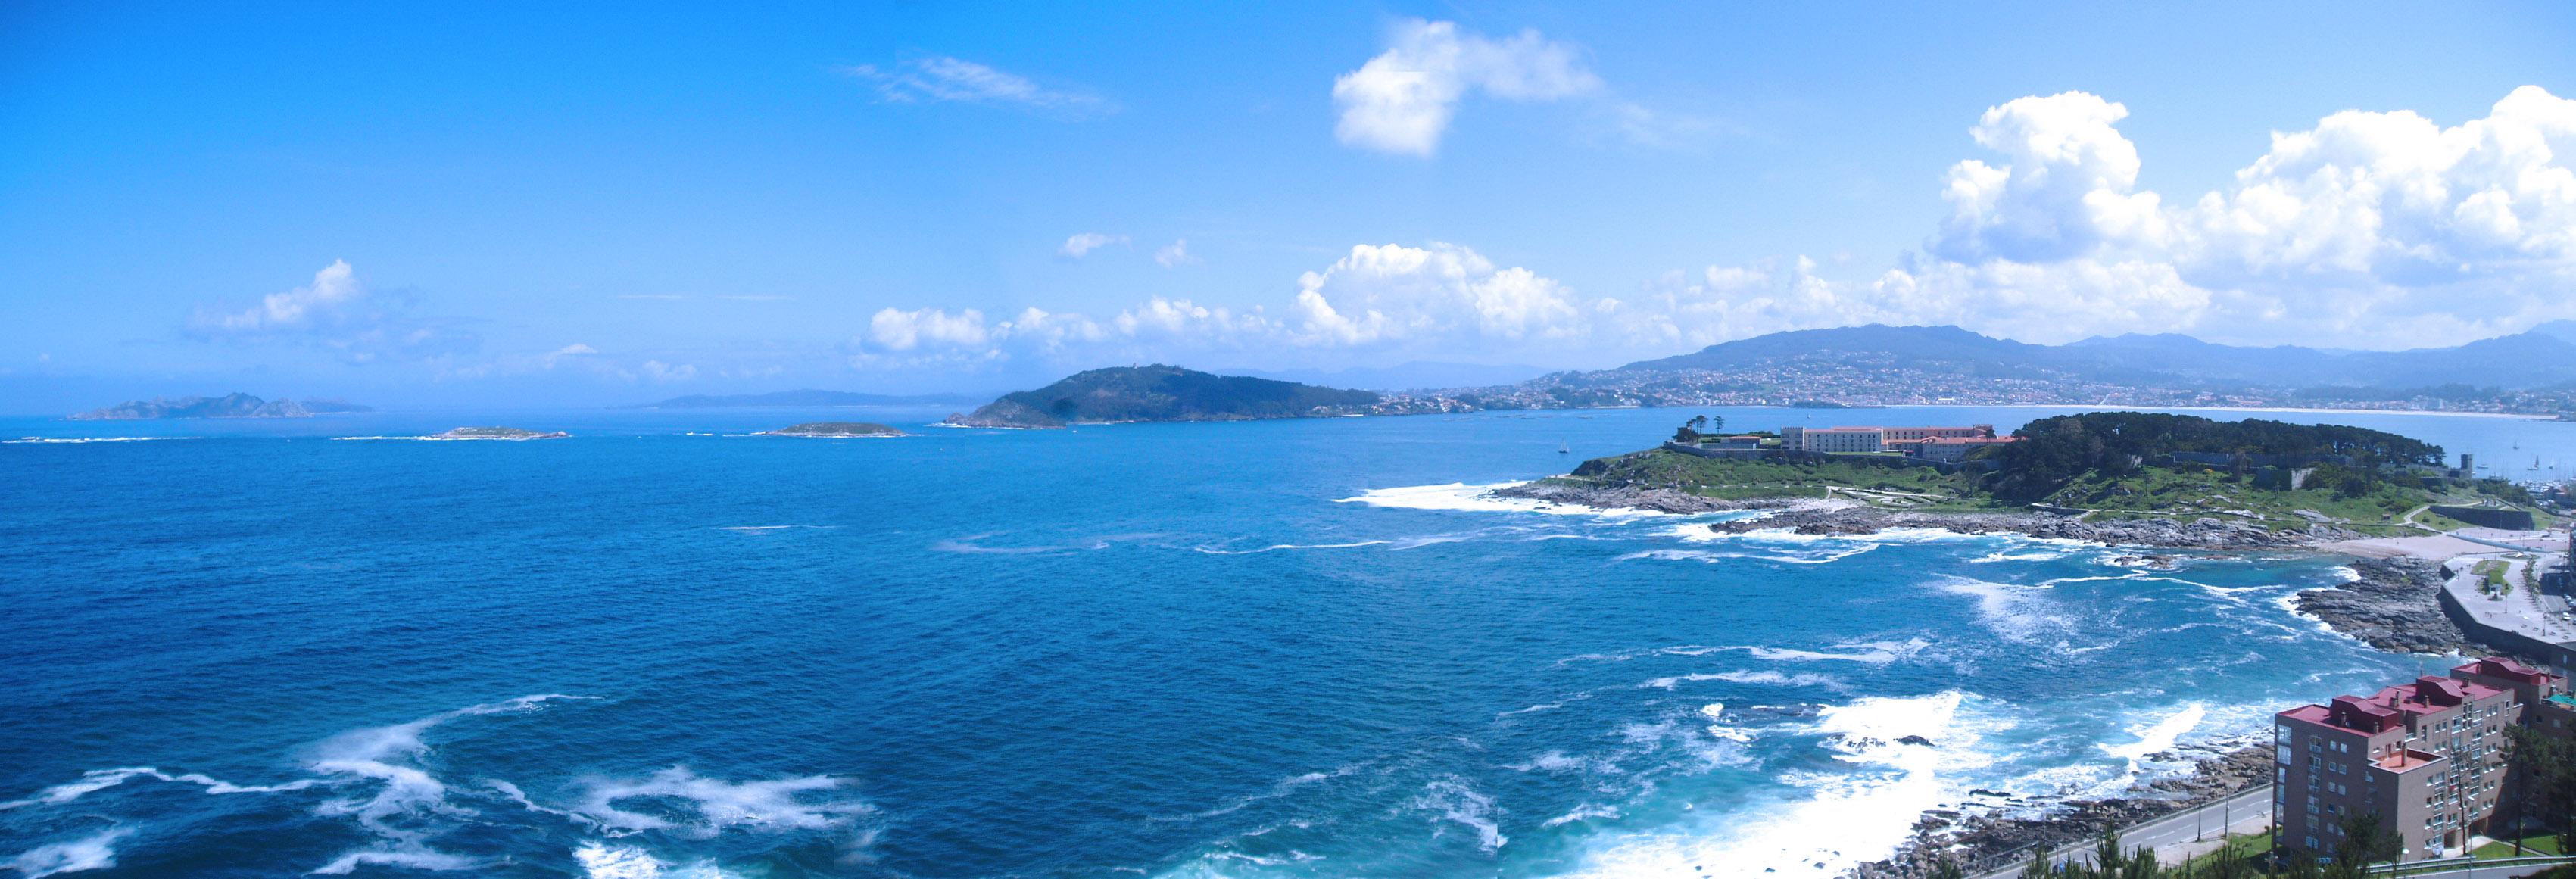 Ocean View 3402x1161